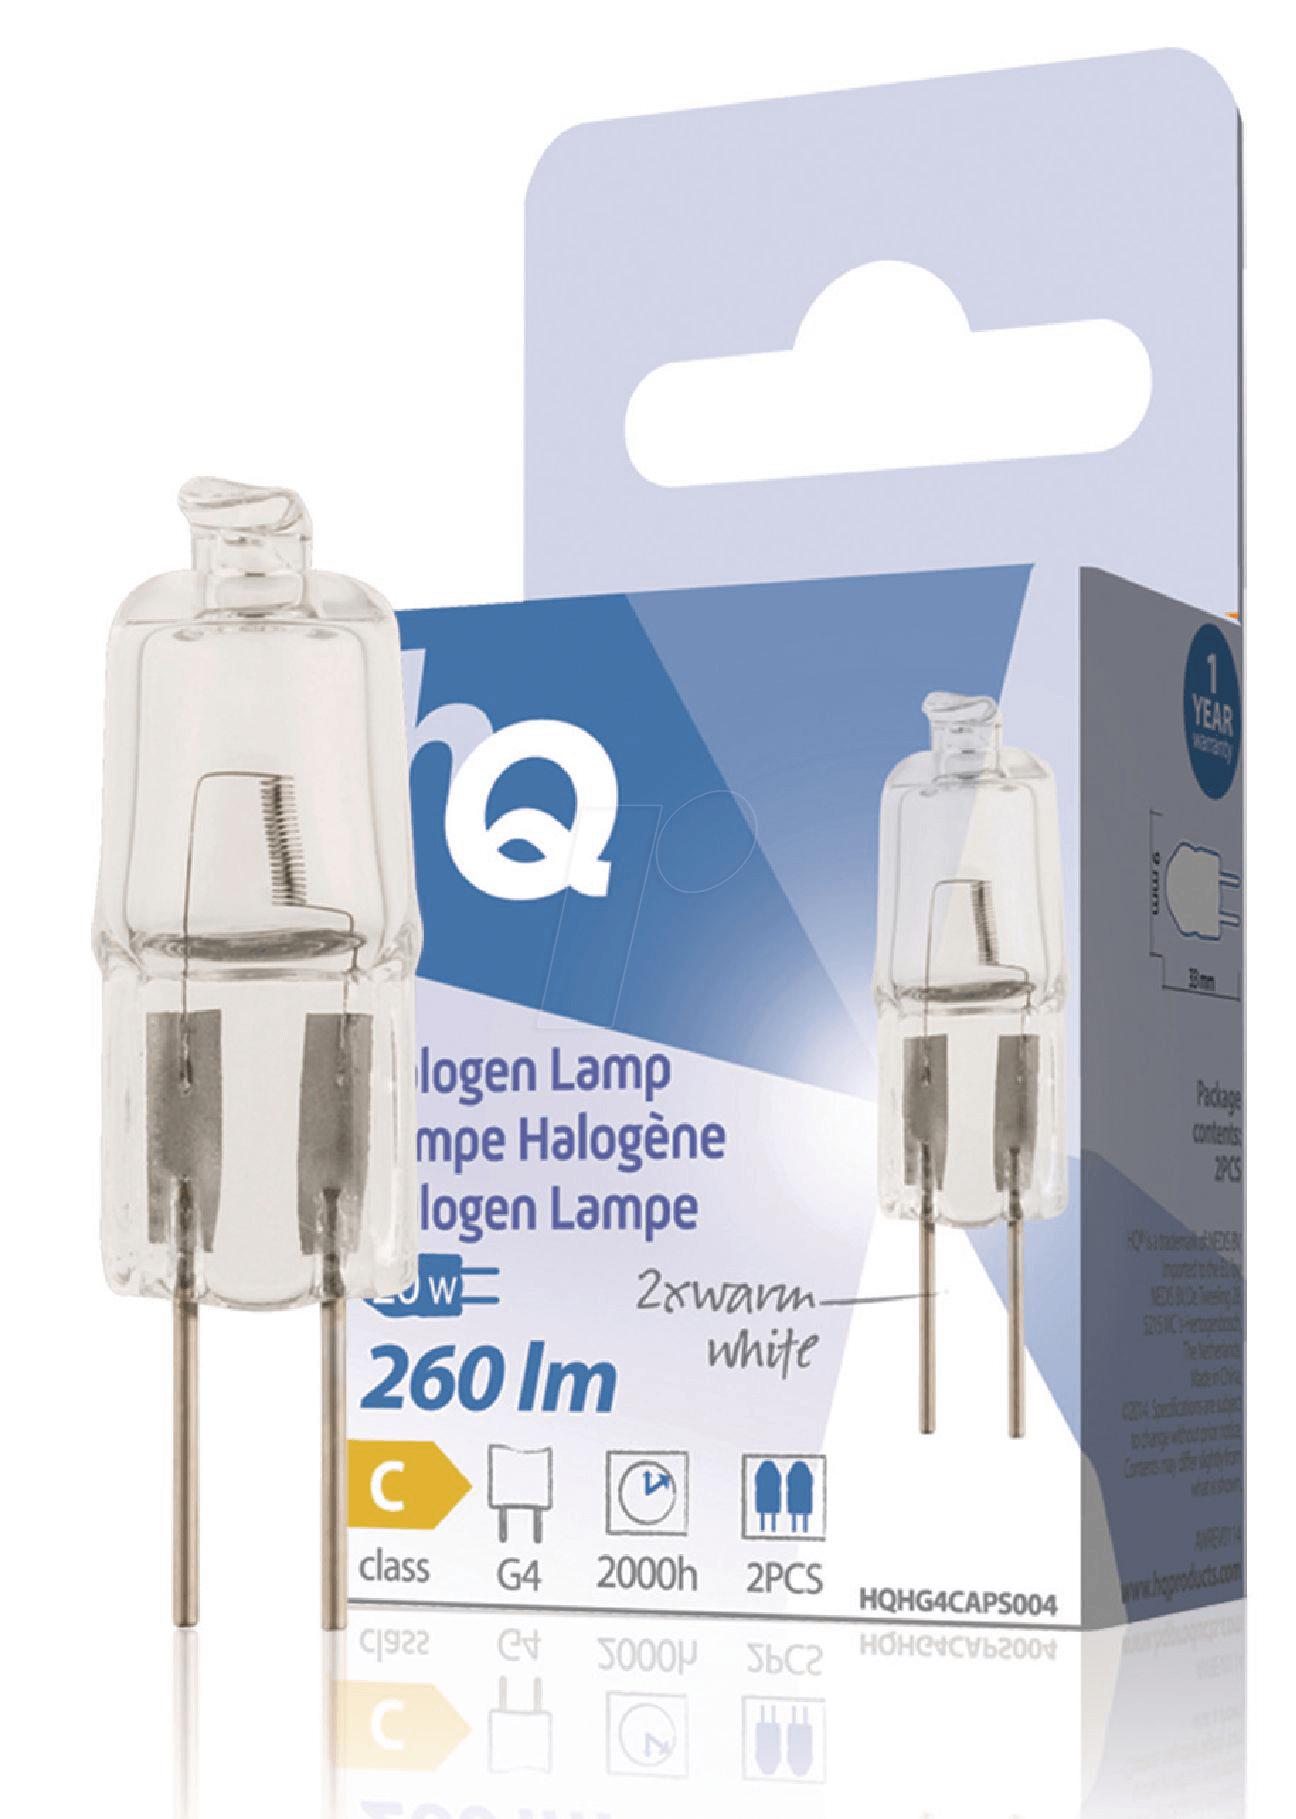 hq hg4caps004 halogen stiftsockellampe g4 20 w 260 lm 2800 k dimmbar bei reichelt elektronik. Black Bedroom Furniture Sets. Home Design Ideas